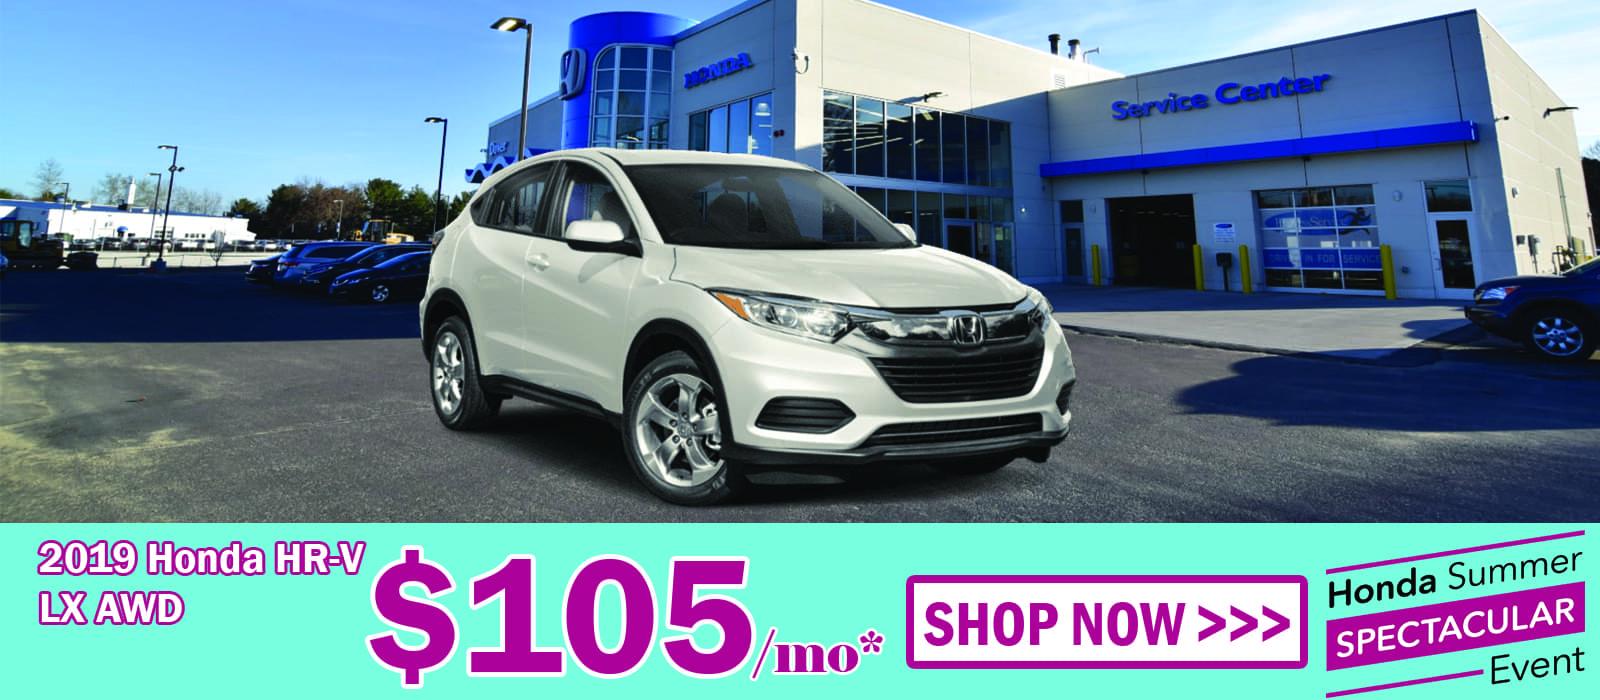 Honda Dealer Locator >> Dover Honda New Honda Used Vehicles Car Dealership In Dover Nh